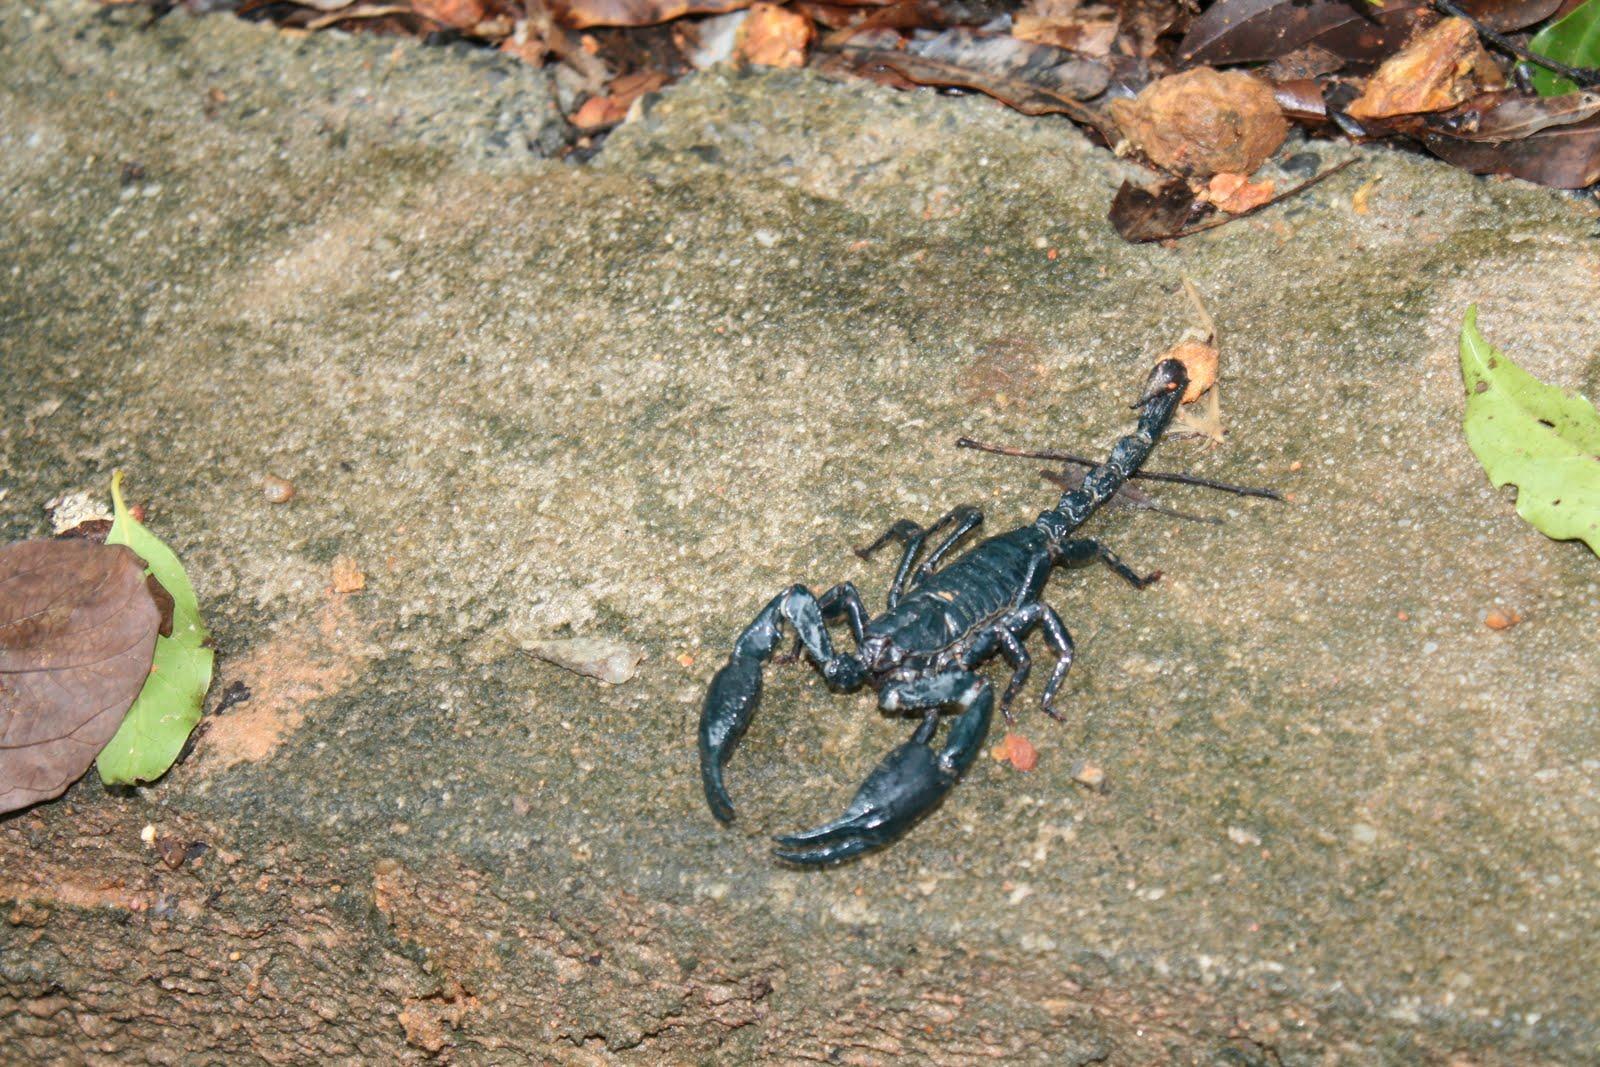 Scorpion Bite On Foot